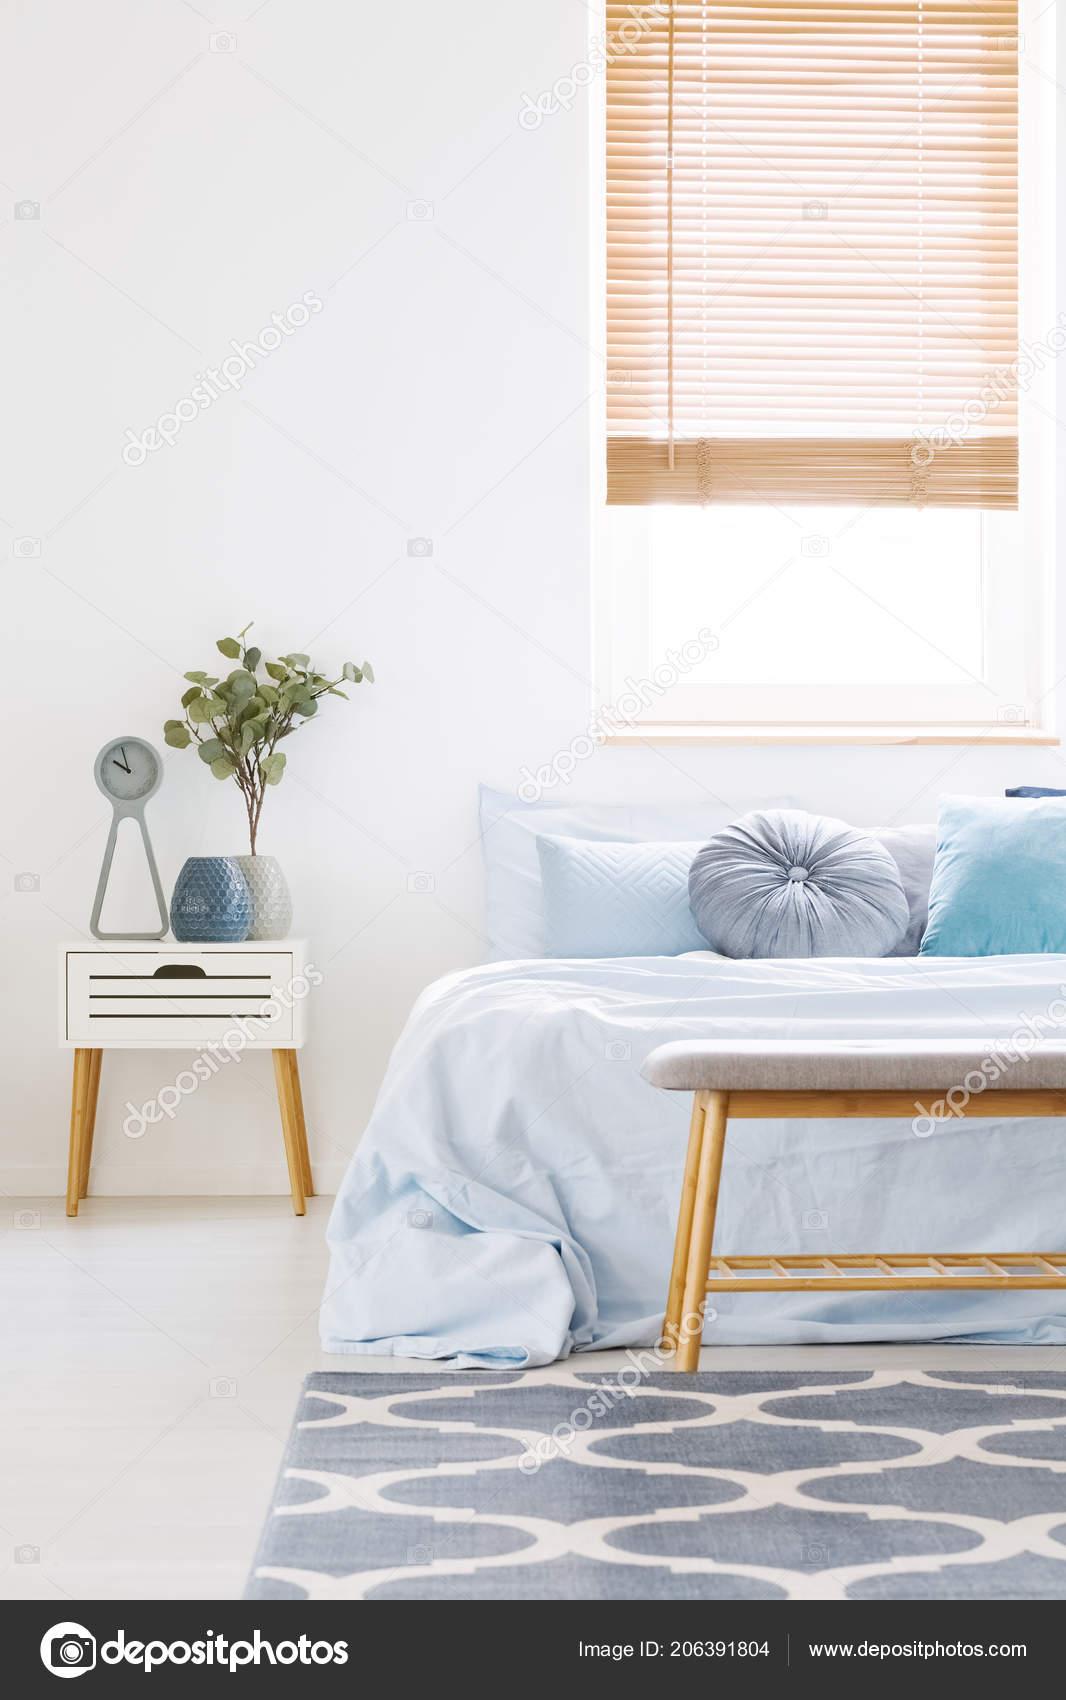 Window Wooden Blinds White Bedroom Interior Bed Light Blue ...